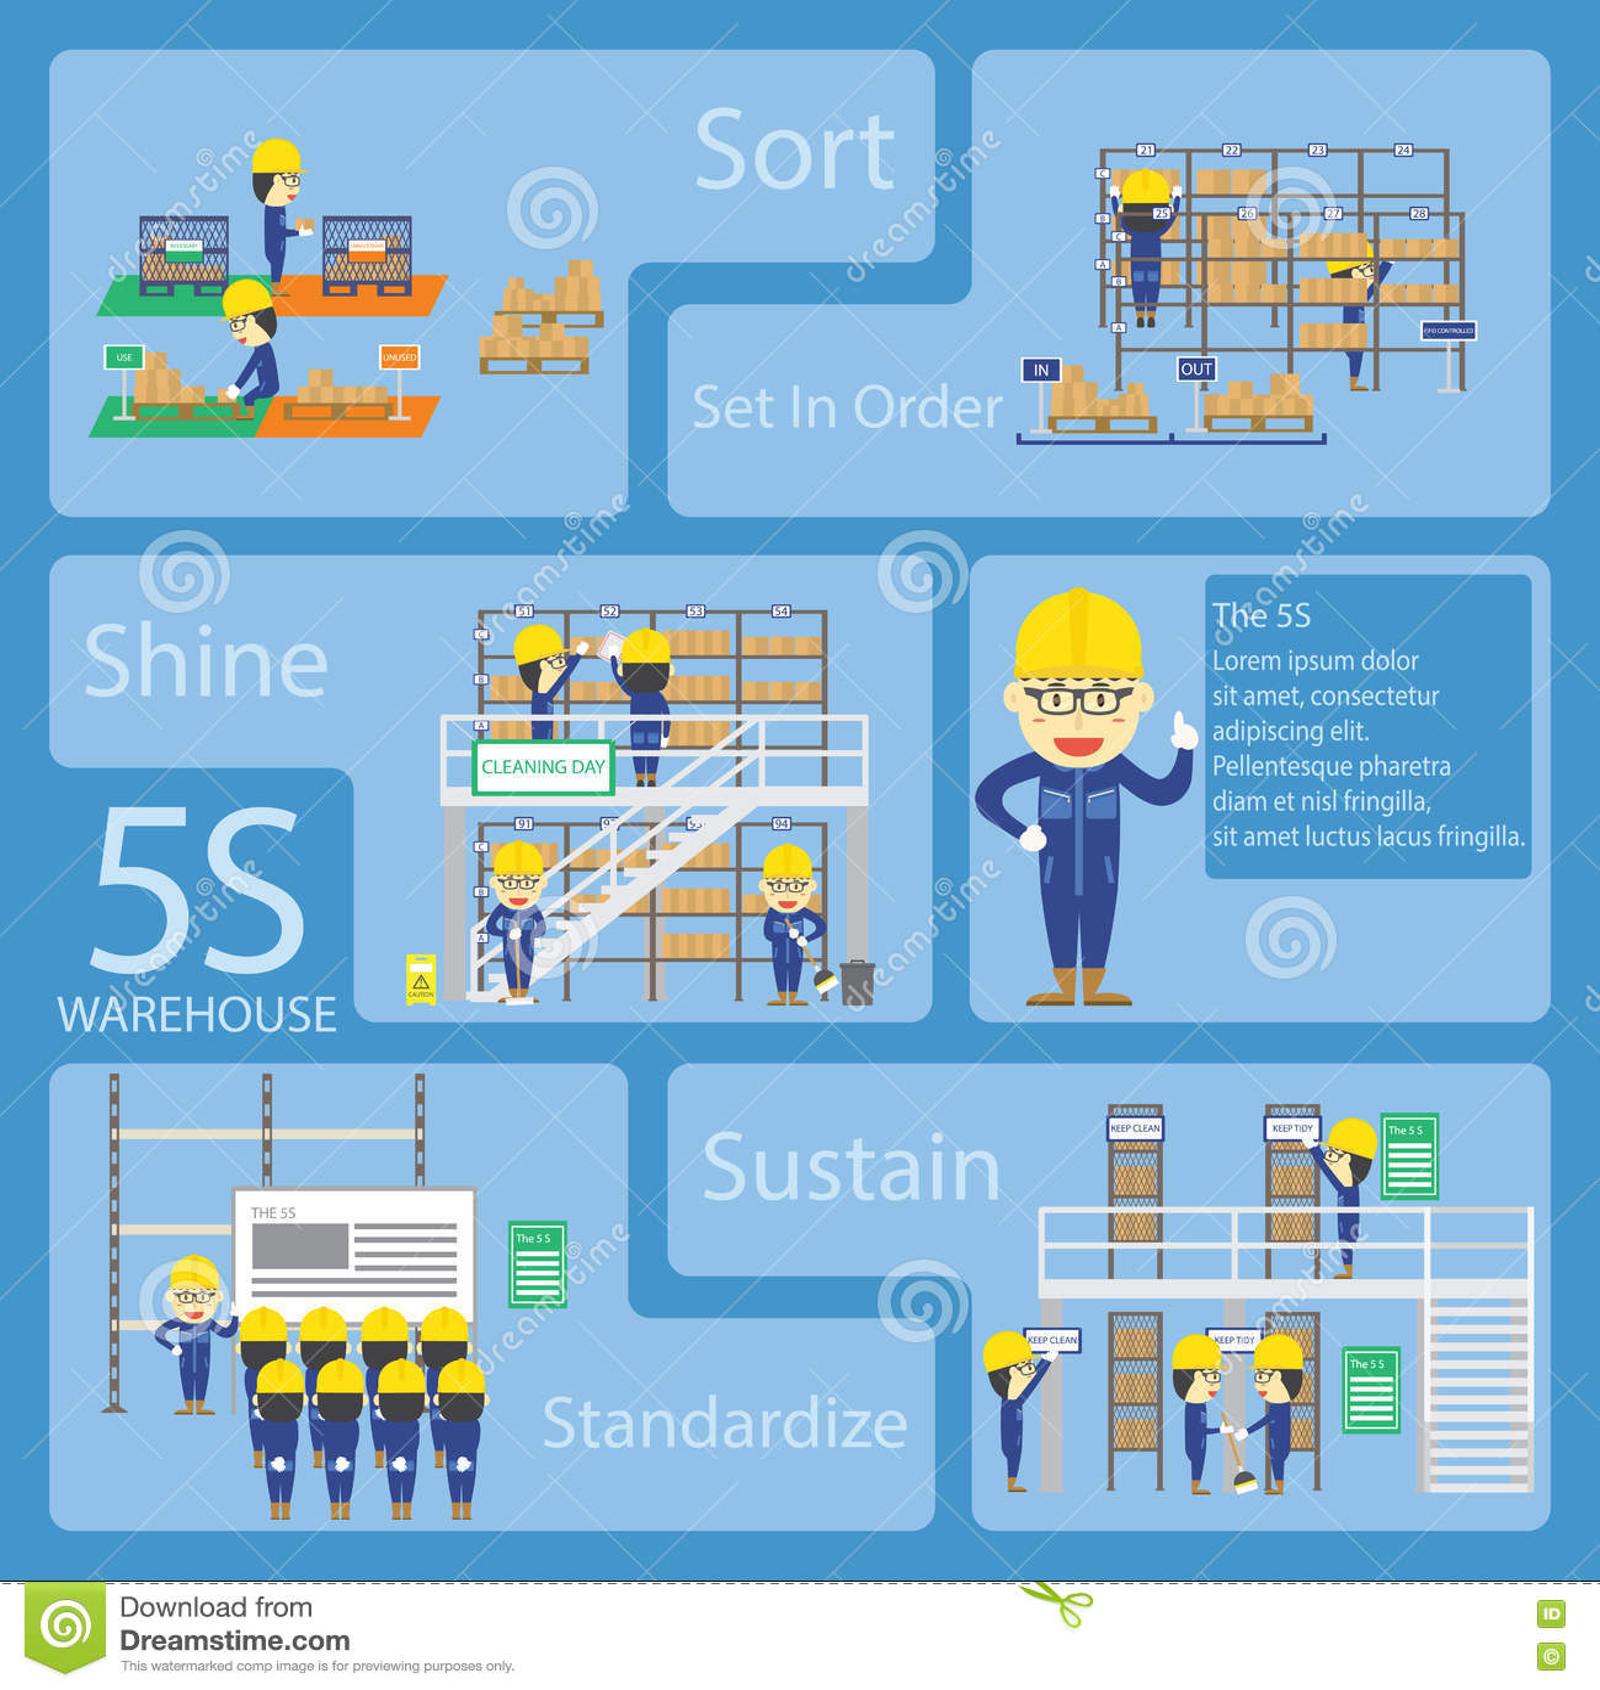 Warehouse Teamwork Cartoon With The 5S Activities Stock